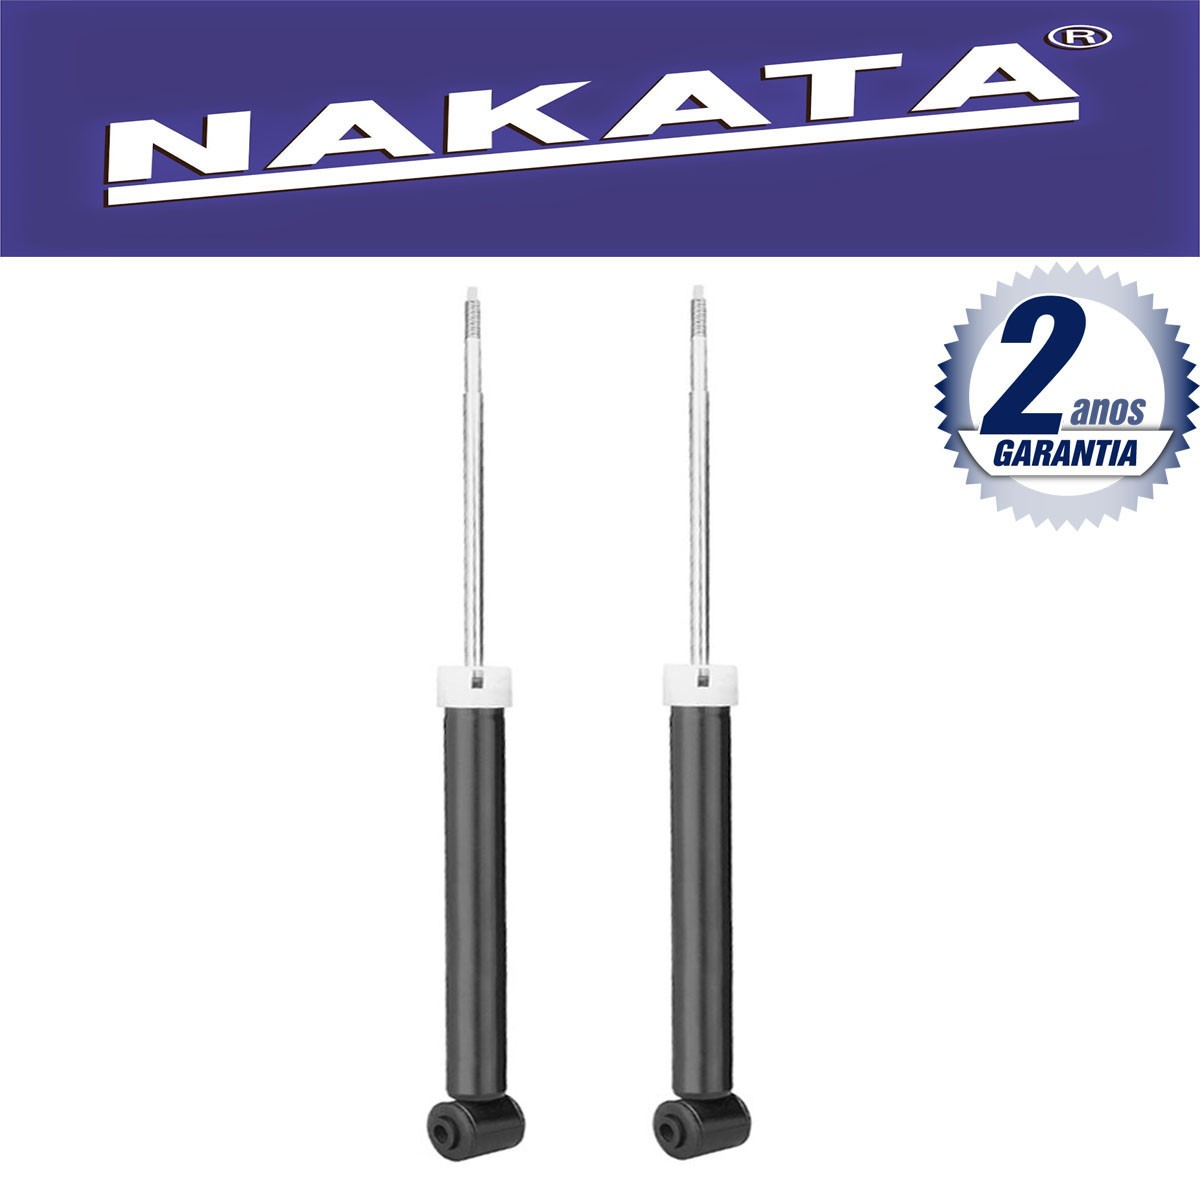 Par de Amortecedores Traseiro Nakata Cobalt 2012 Até 2015